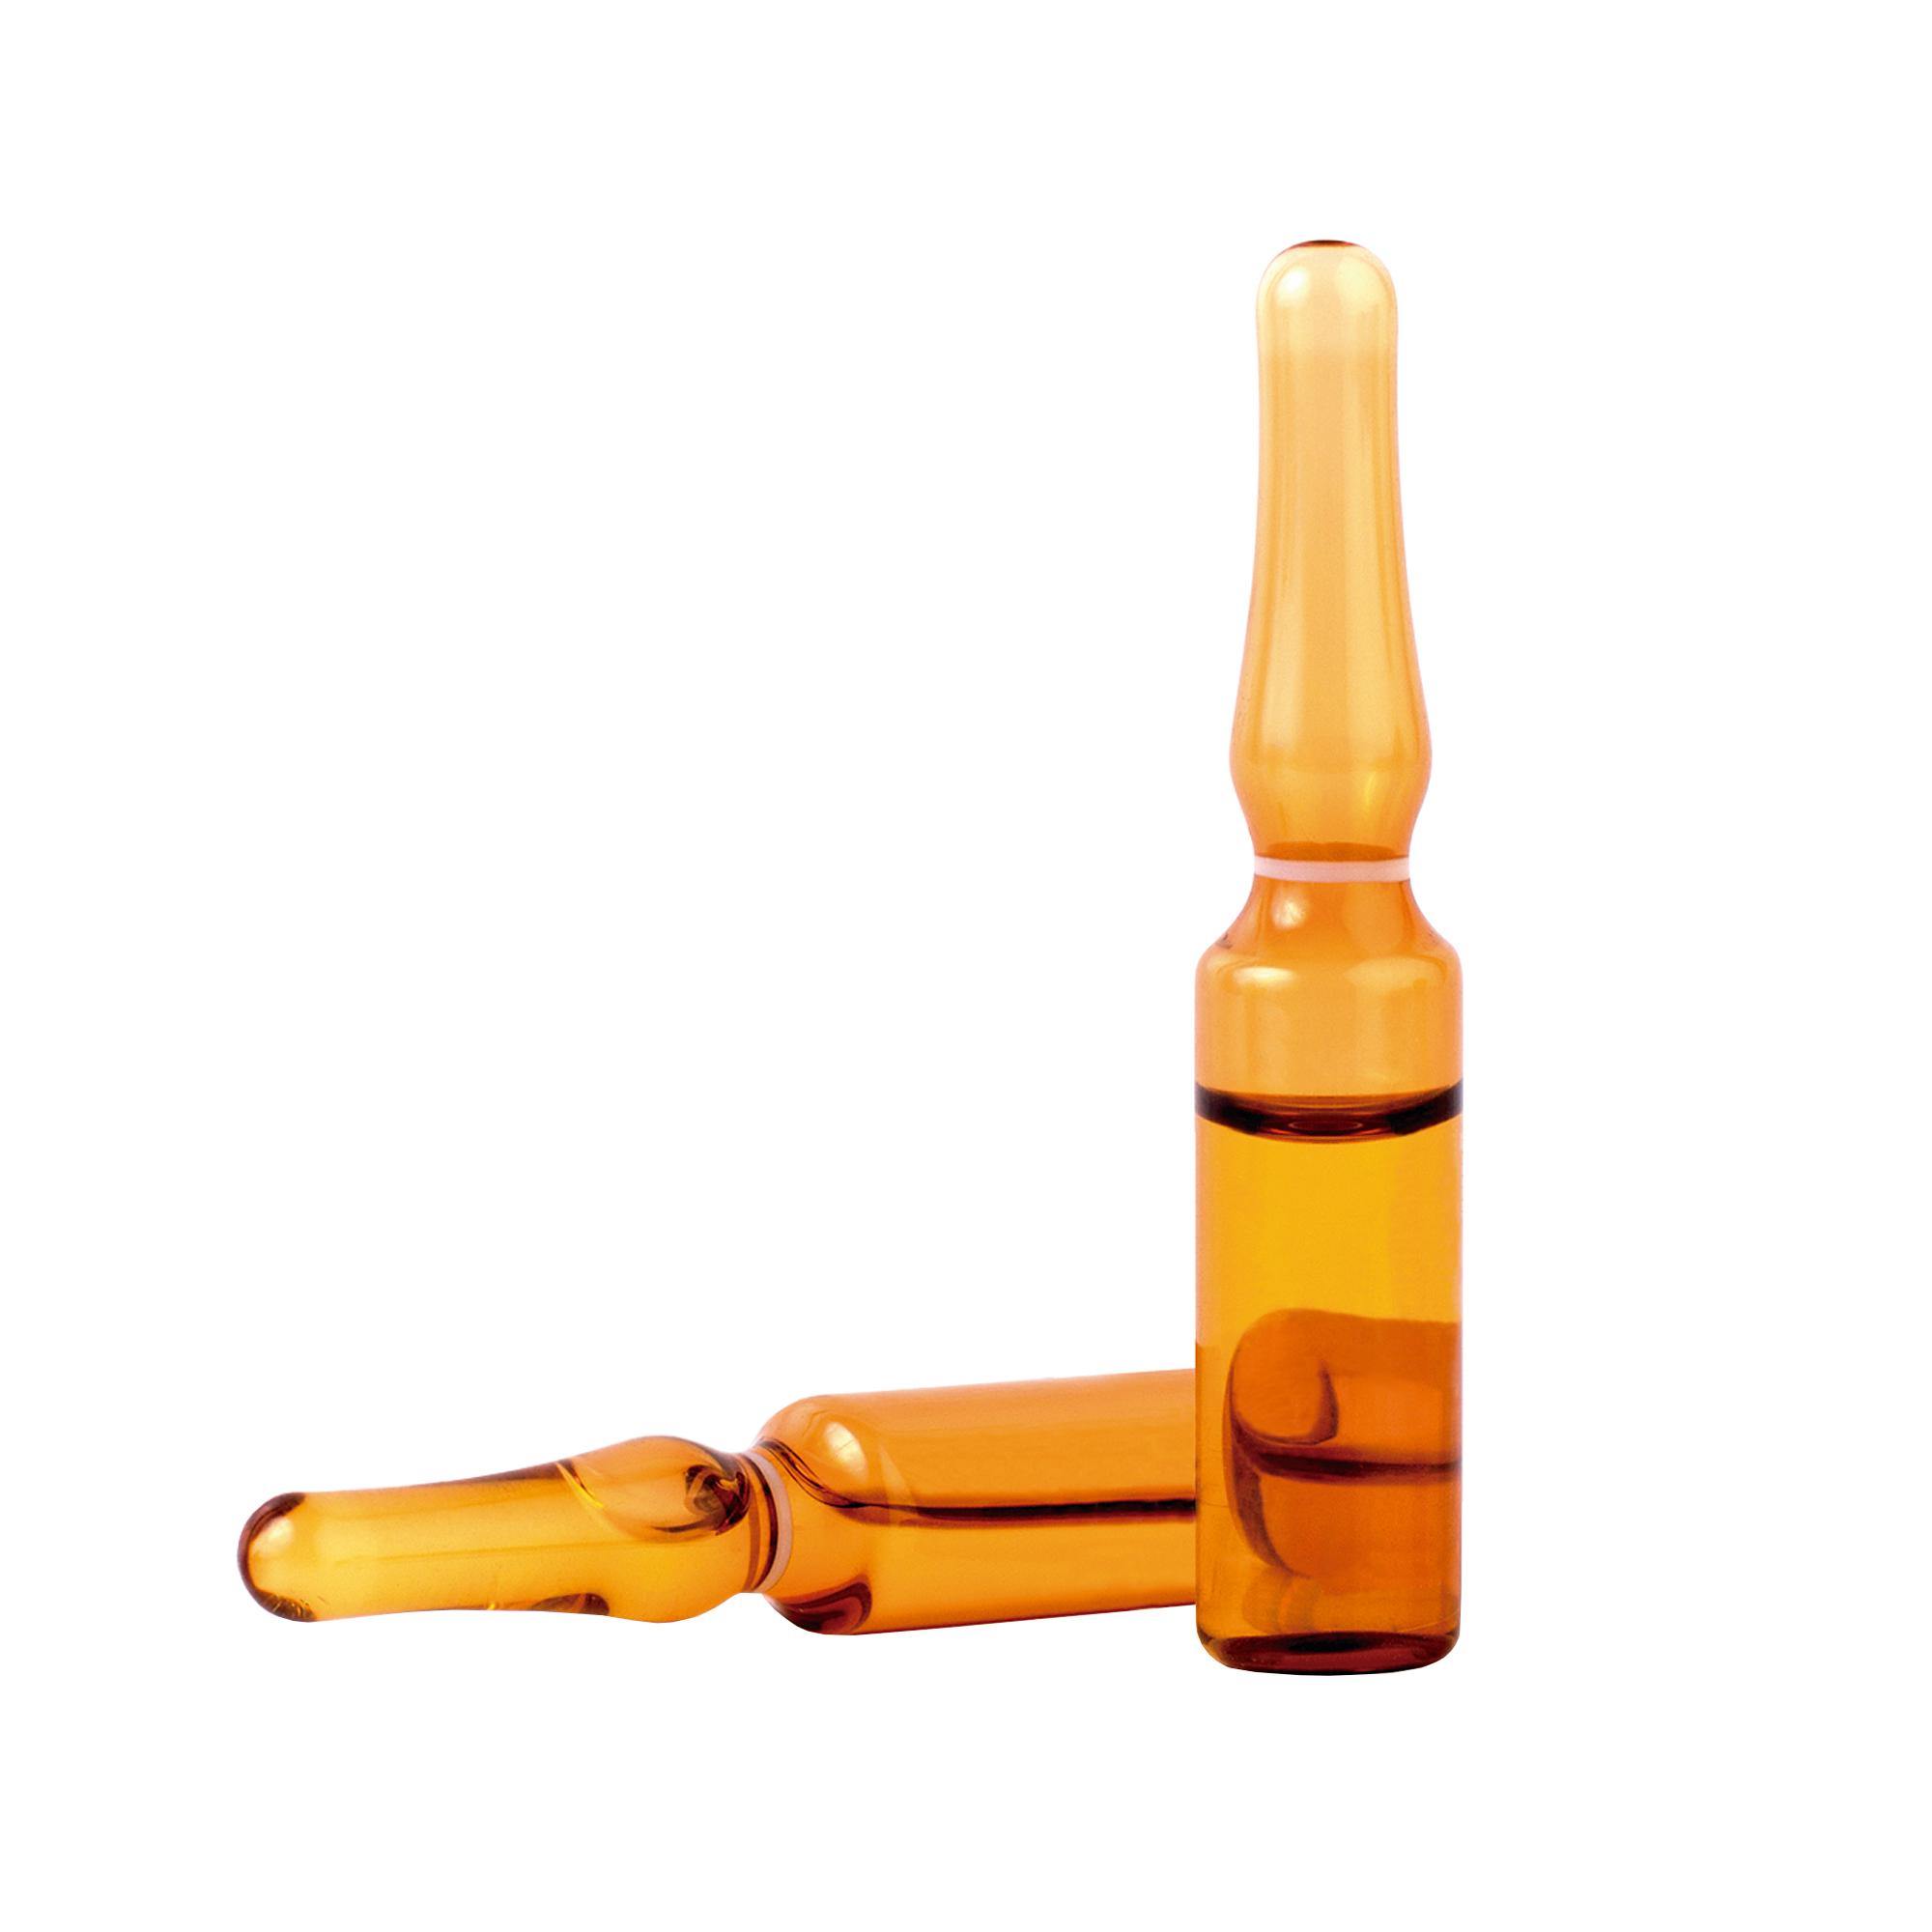 Hypothalam Suis Inj Org